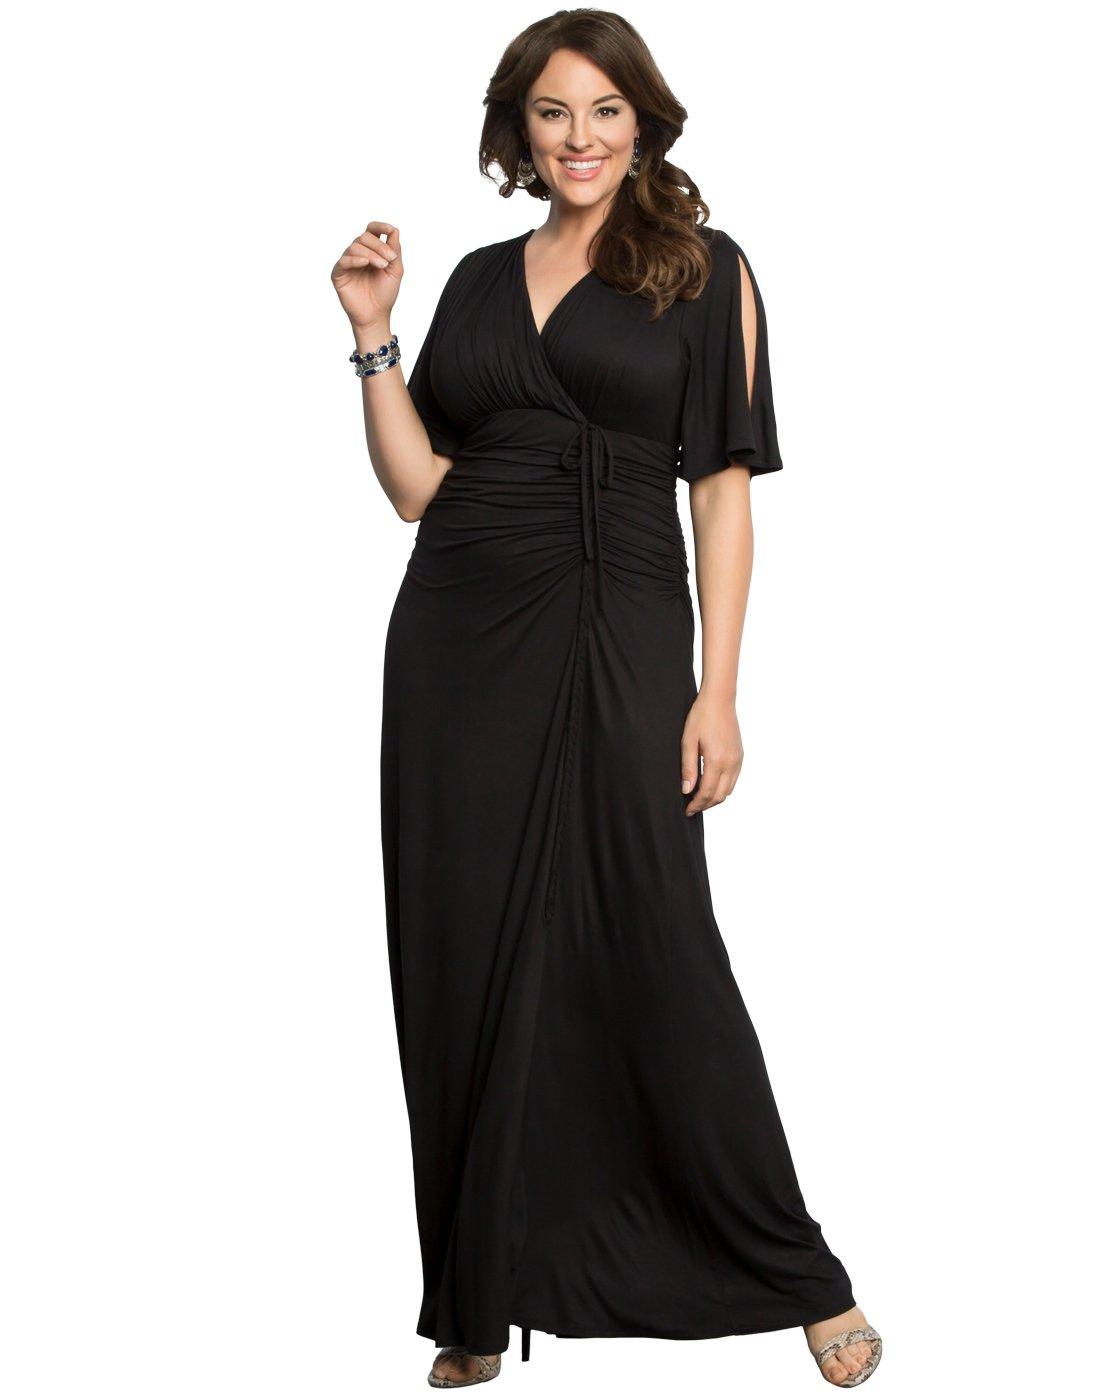 KIYONNA Women's Plus Size Bella Braided Maxi Dress 2X Black Noir